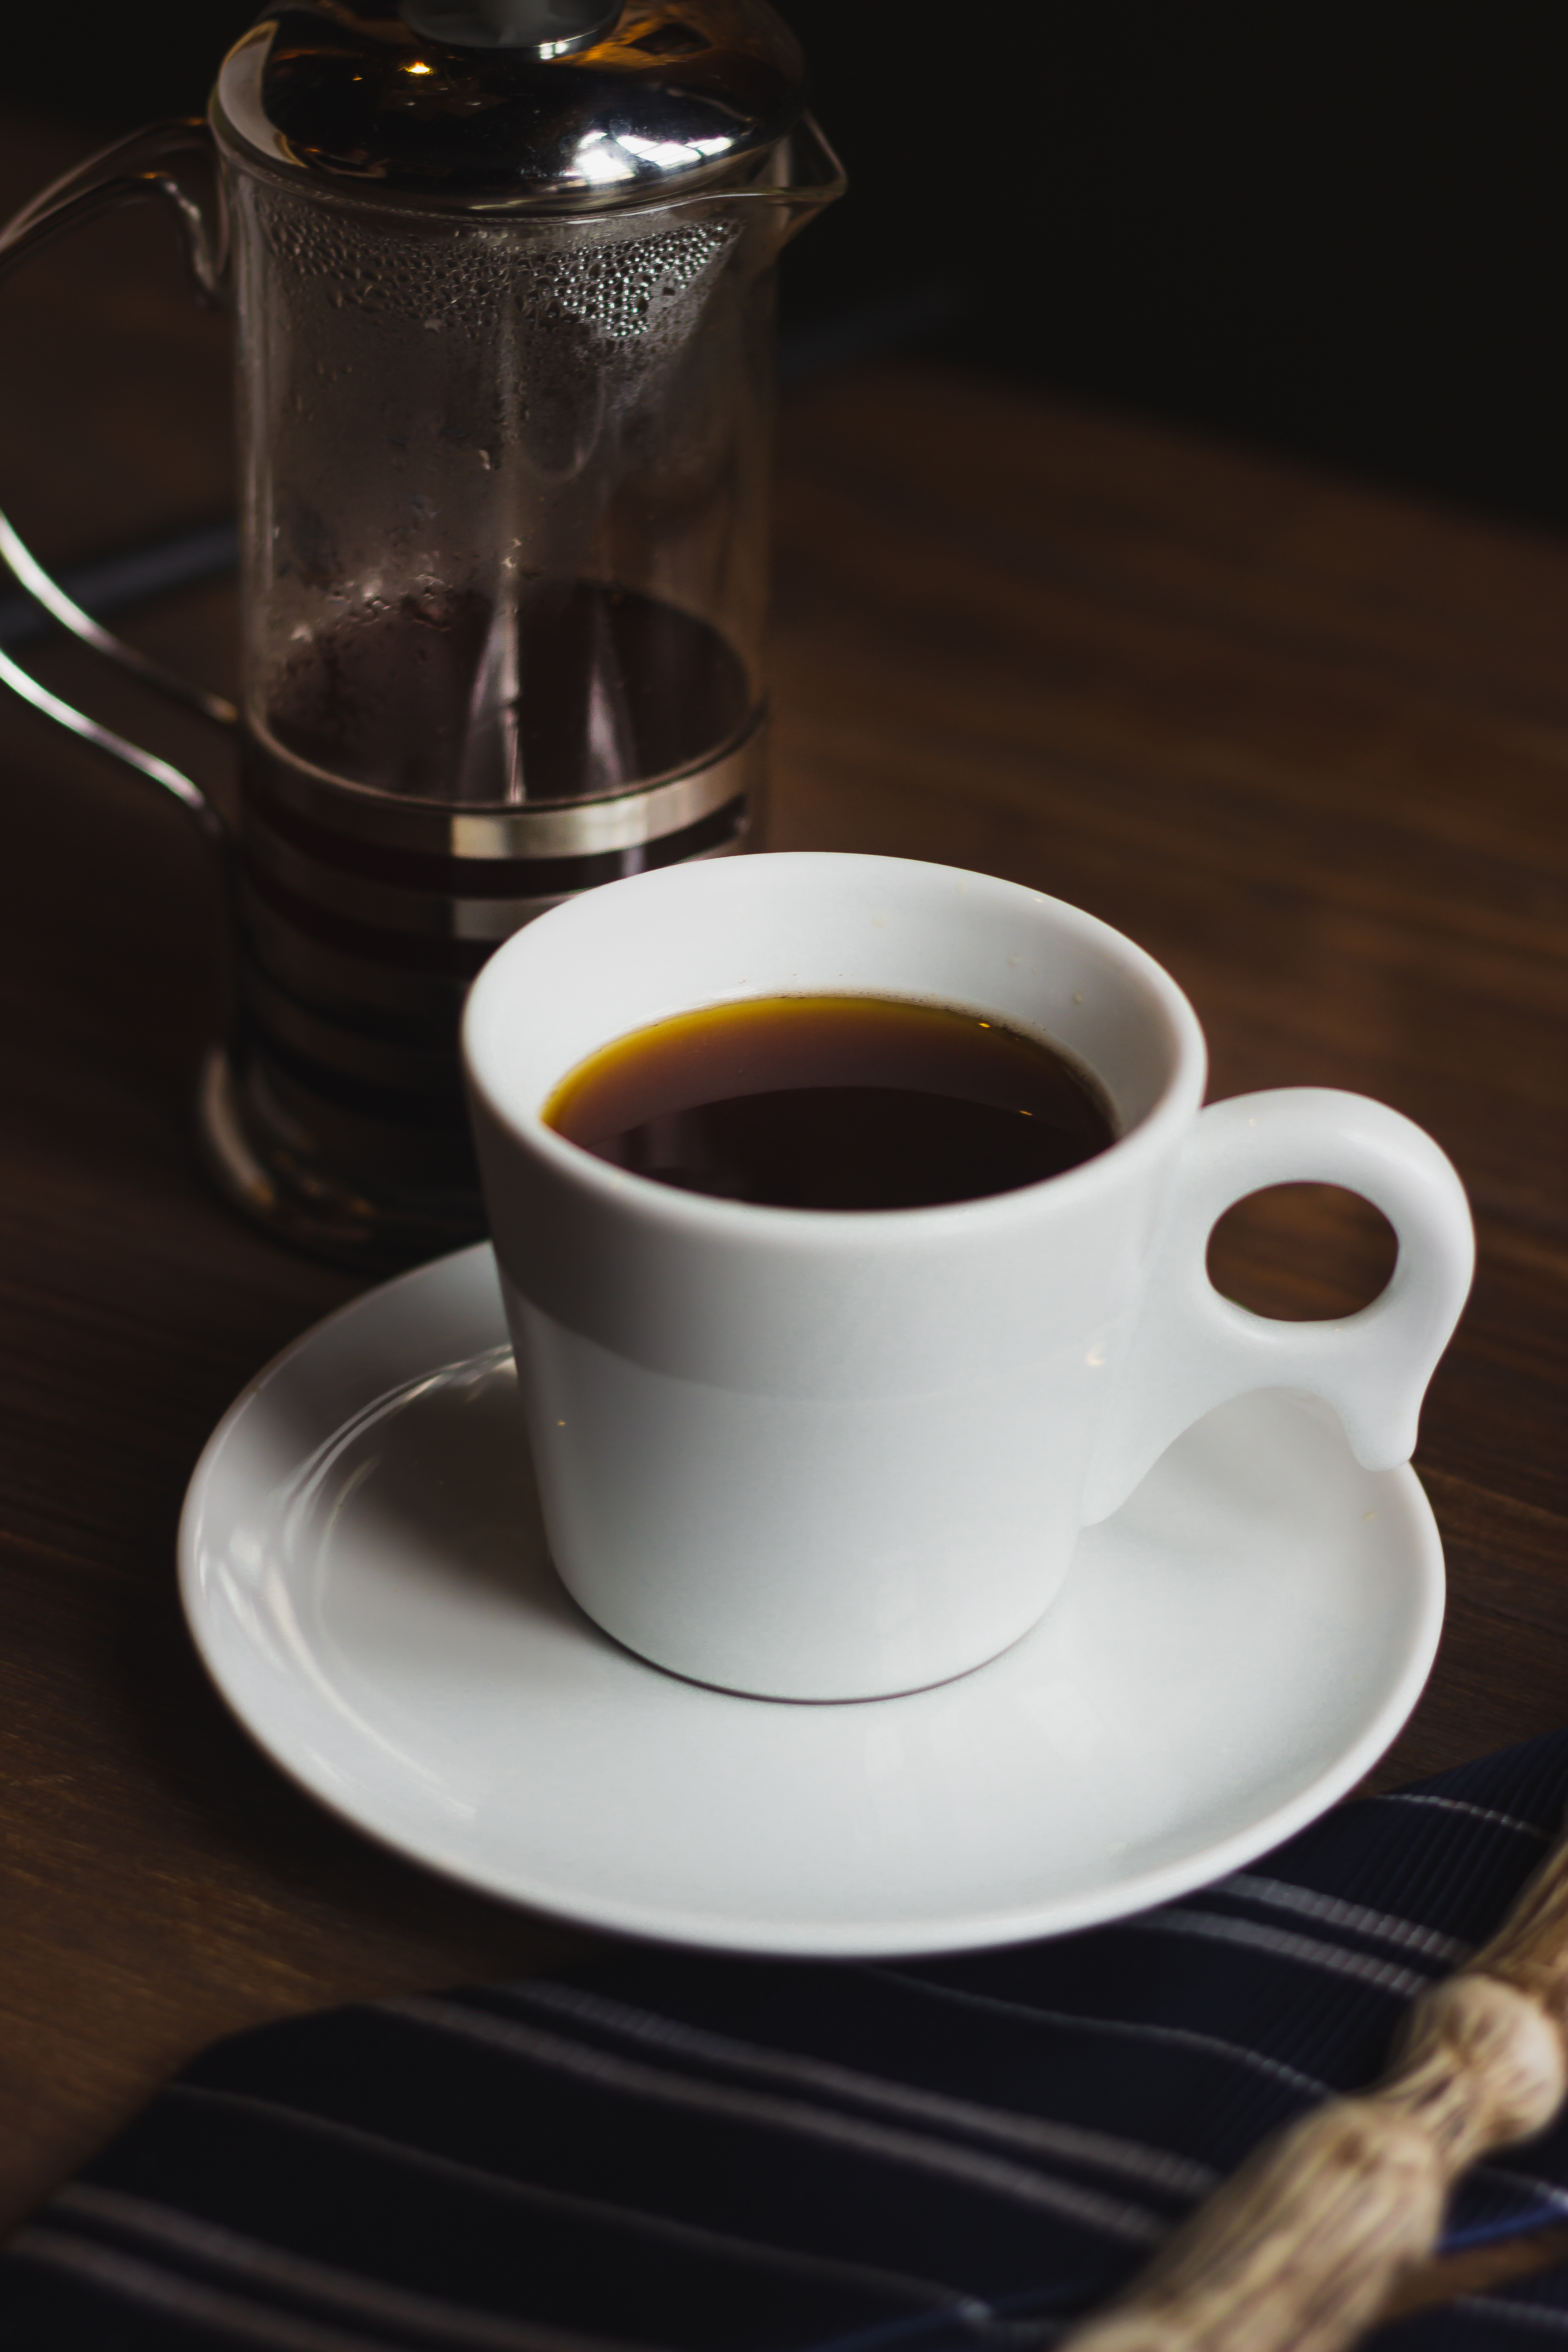 Prensa francesa e xícara de café